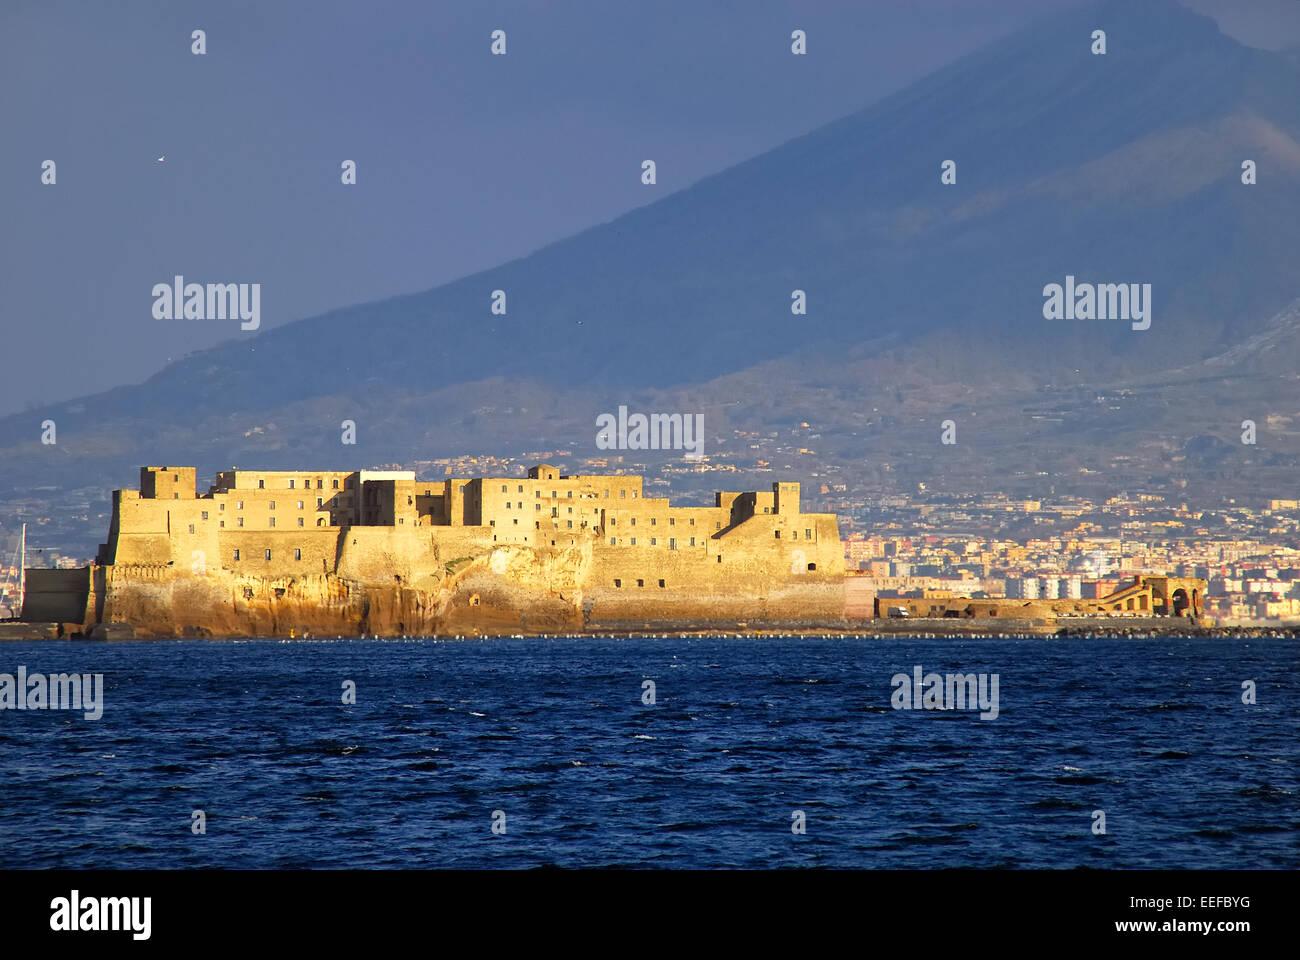 Naples, Italy. Gulf of Naples, Castel dell'Ovo and Vesuvius. - Stock Image